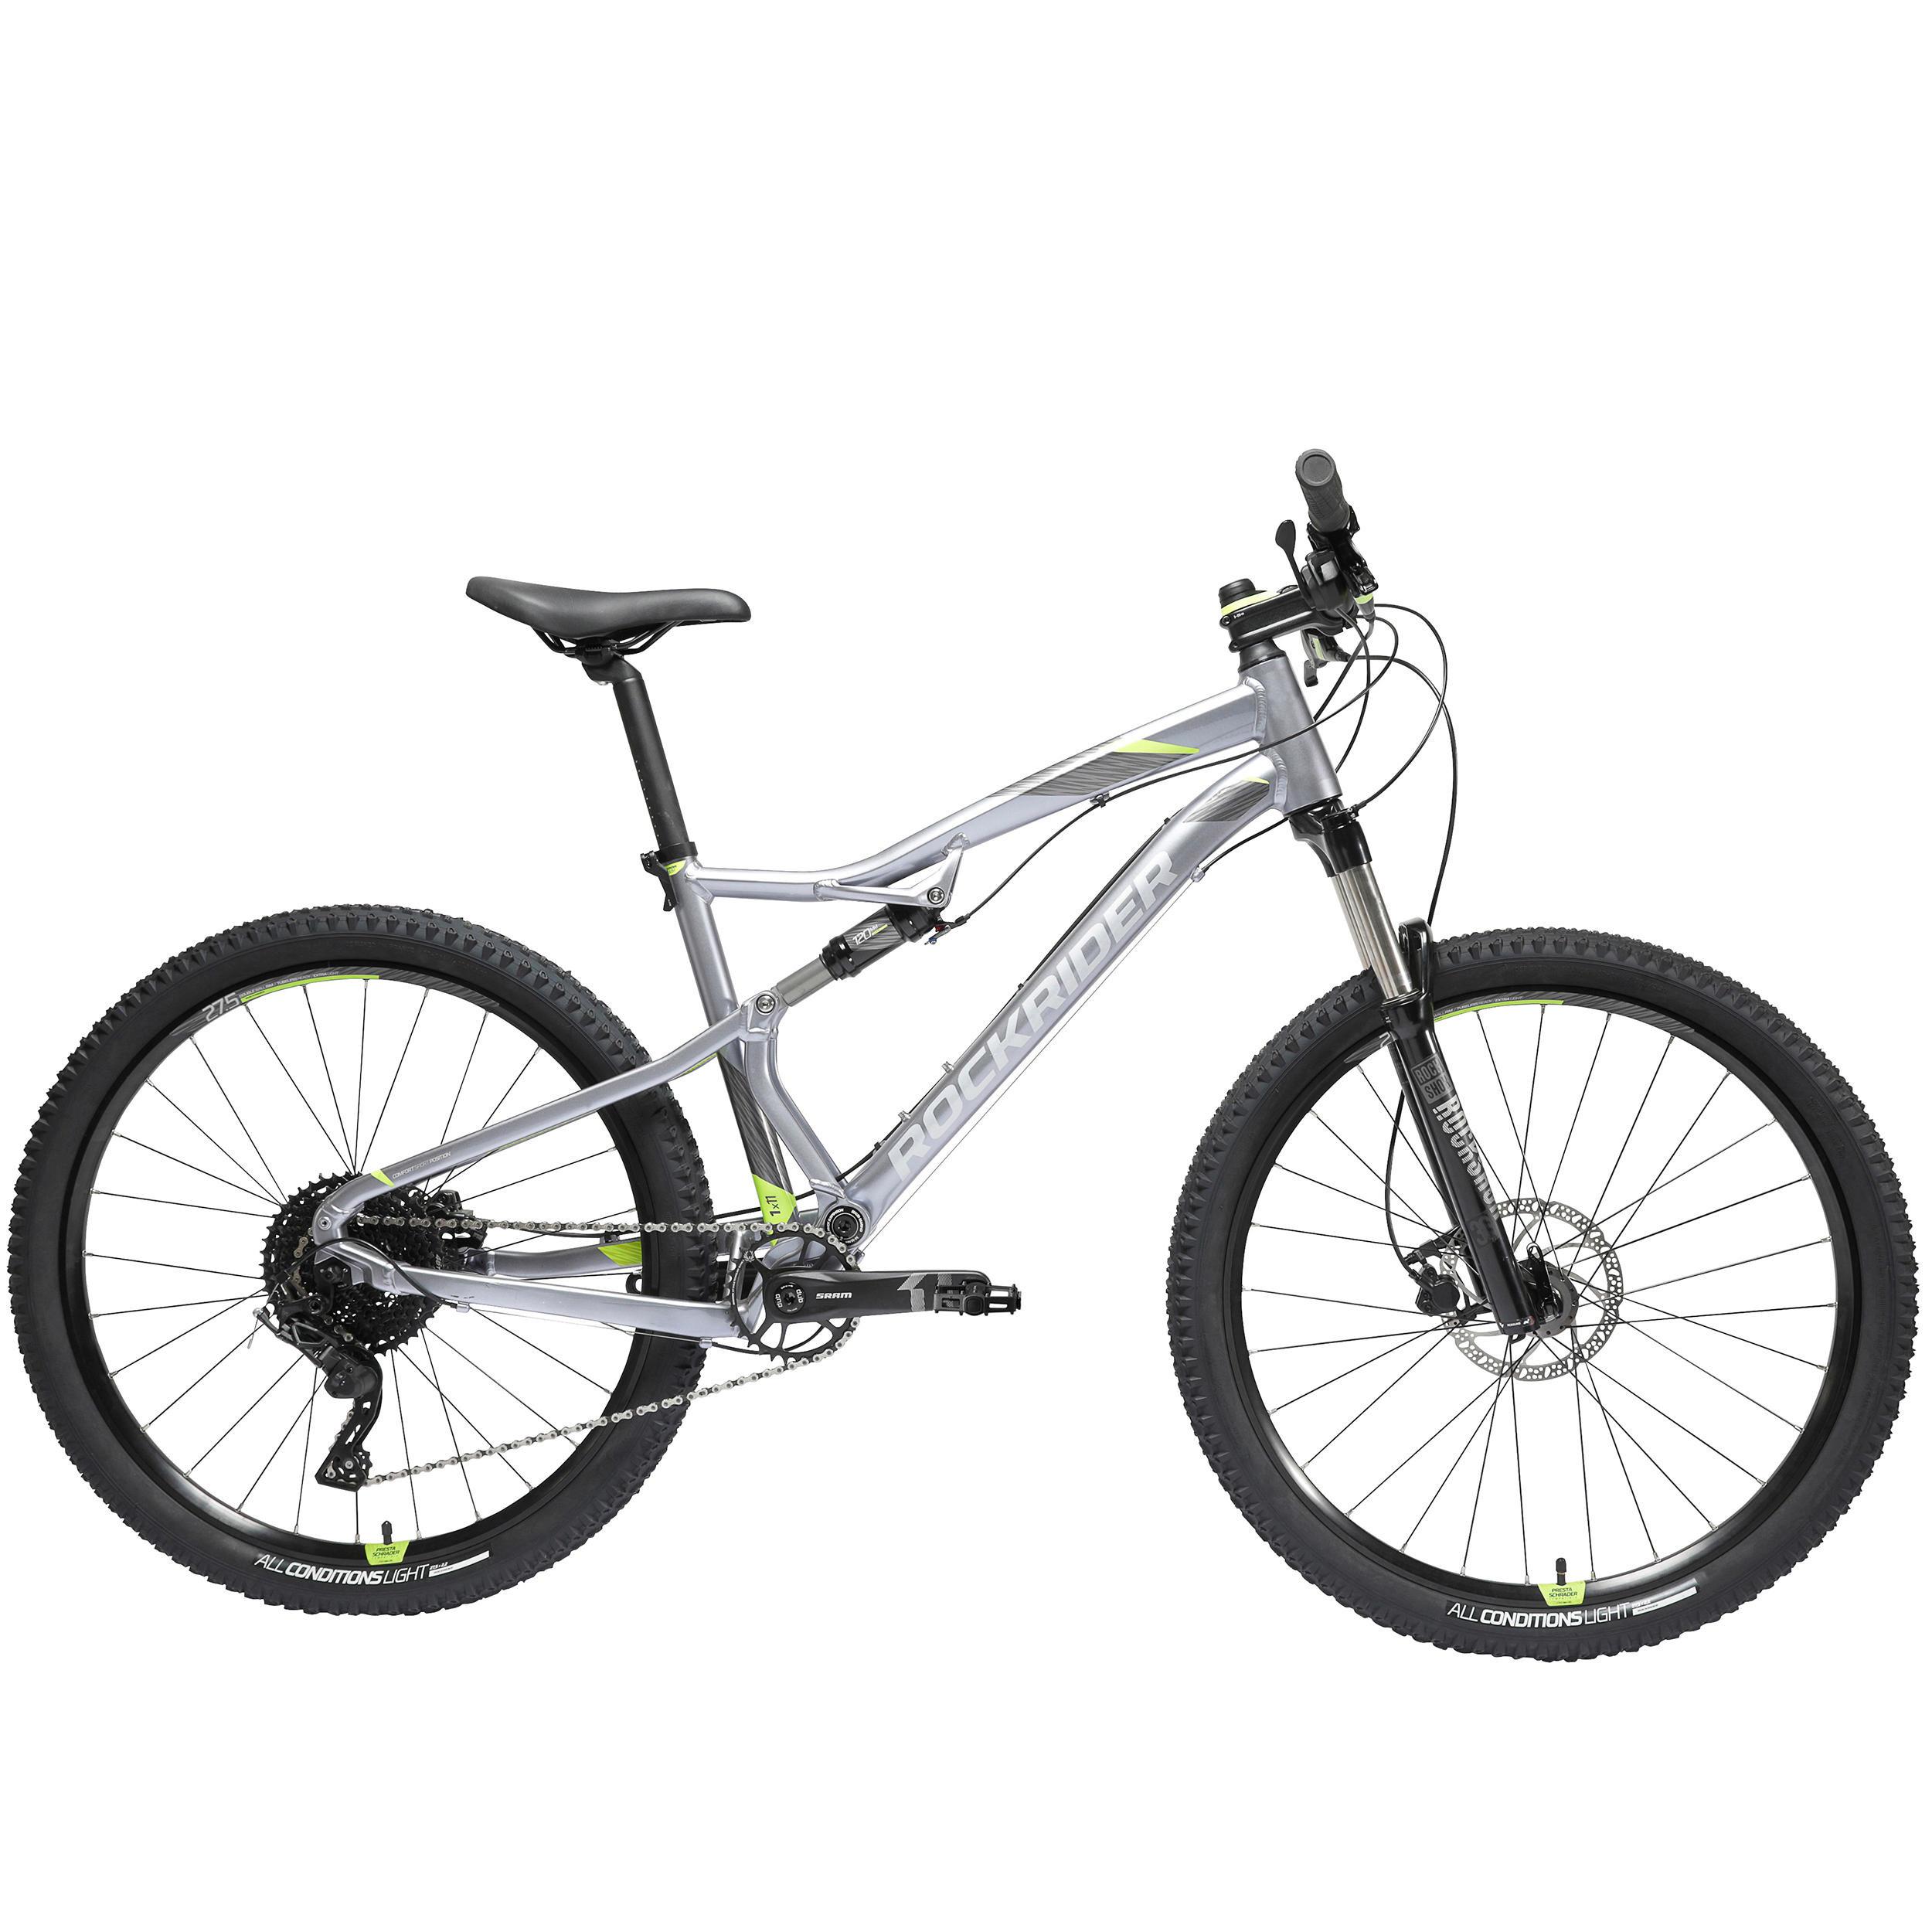 "Bicicleta De Montaña Doble Suspension Rockrider St 530S 27,5"" 9V Negro Rojo"